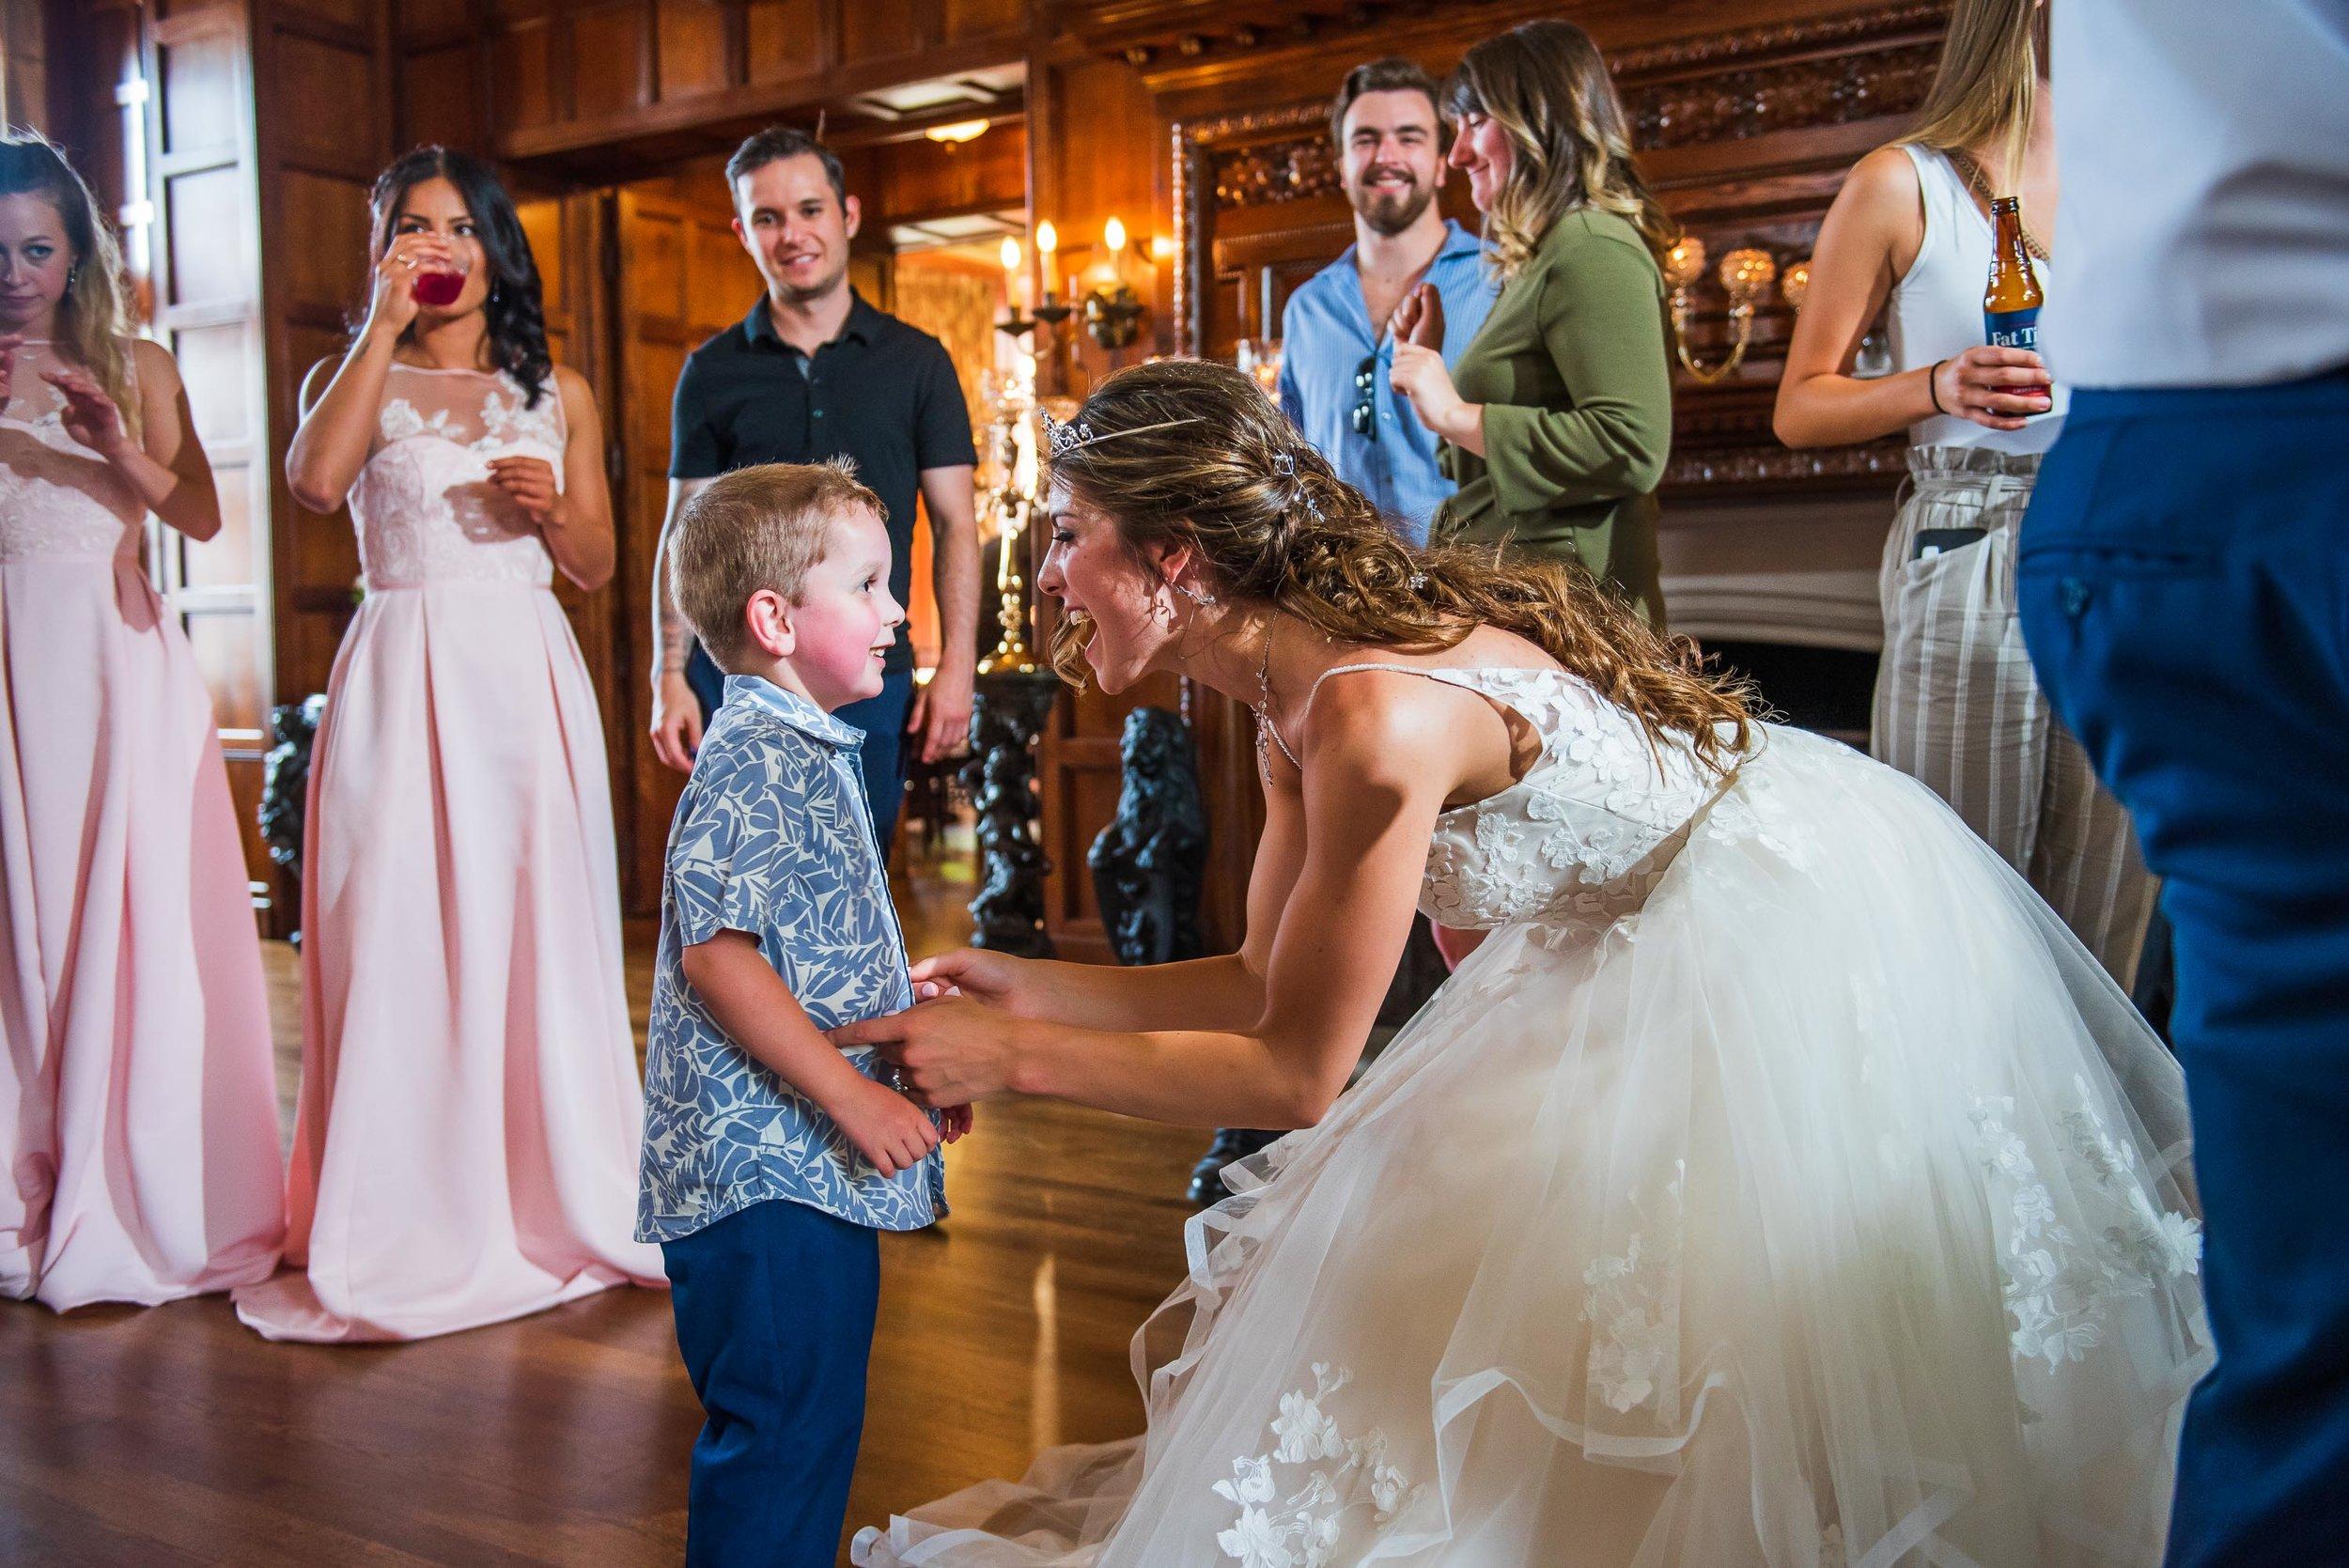 thornewood castle wedding 73.jpg